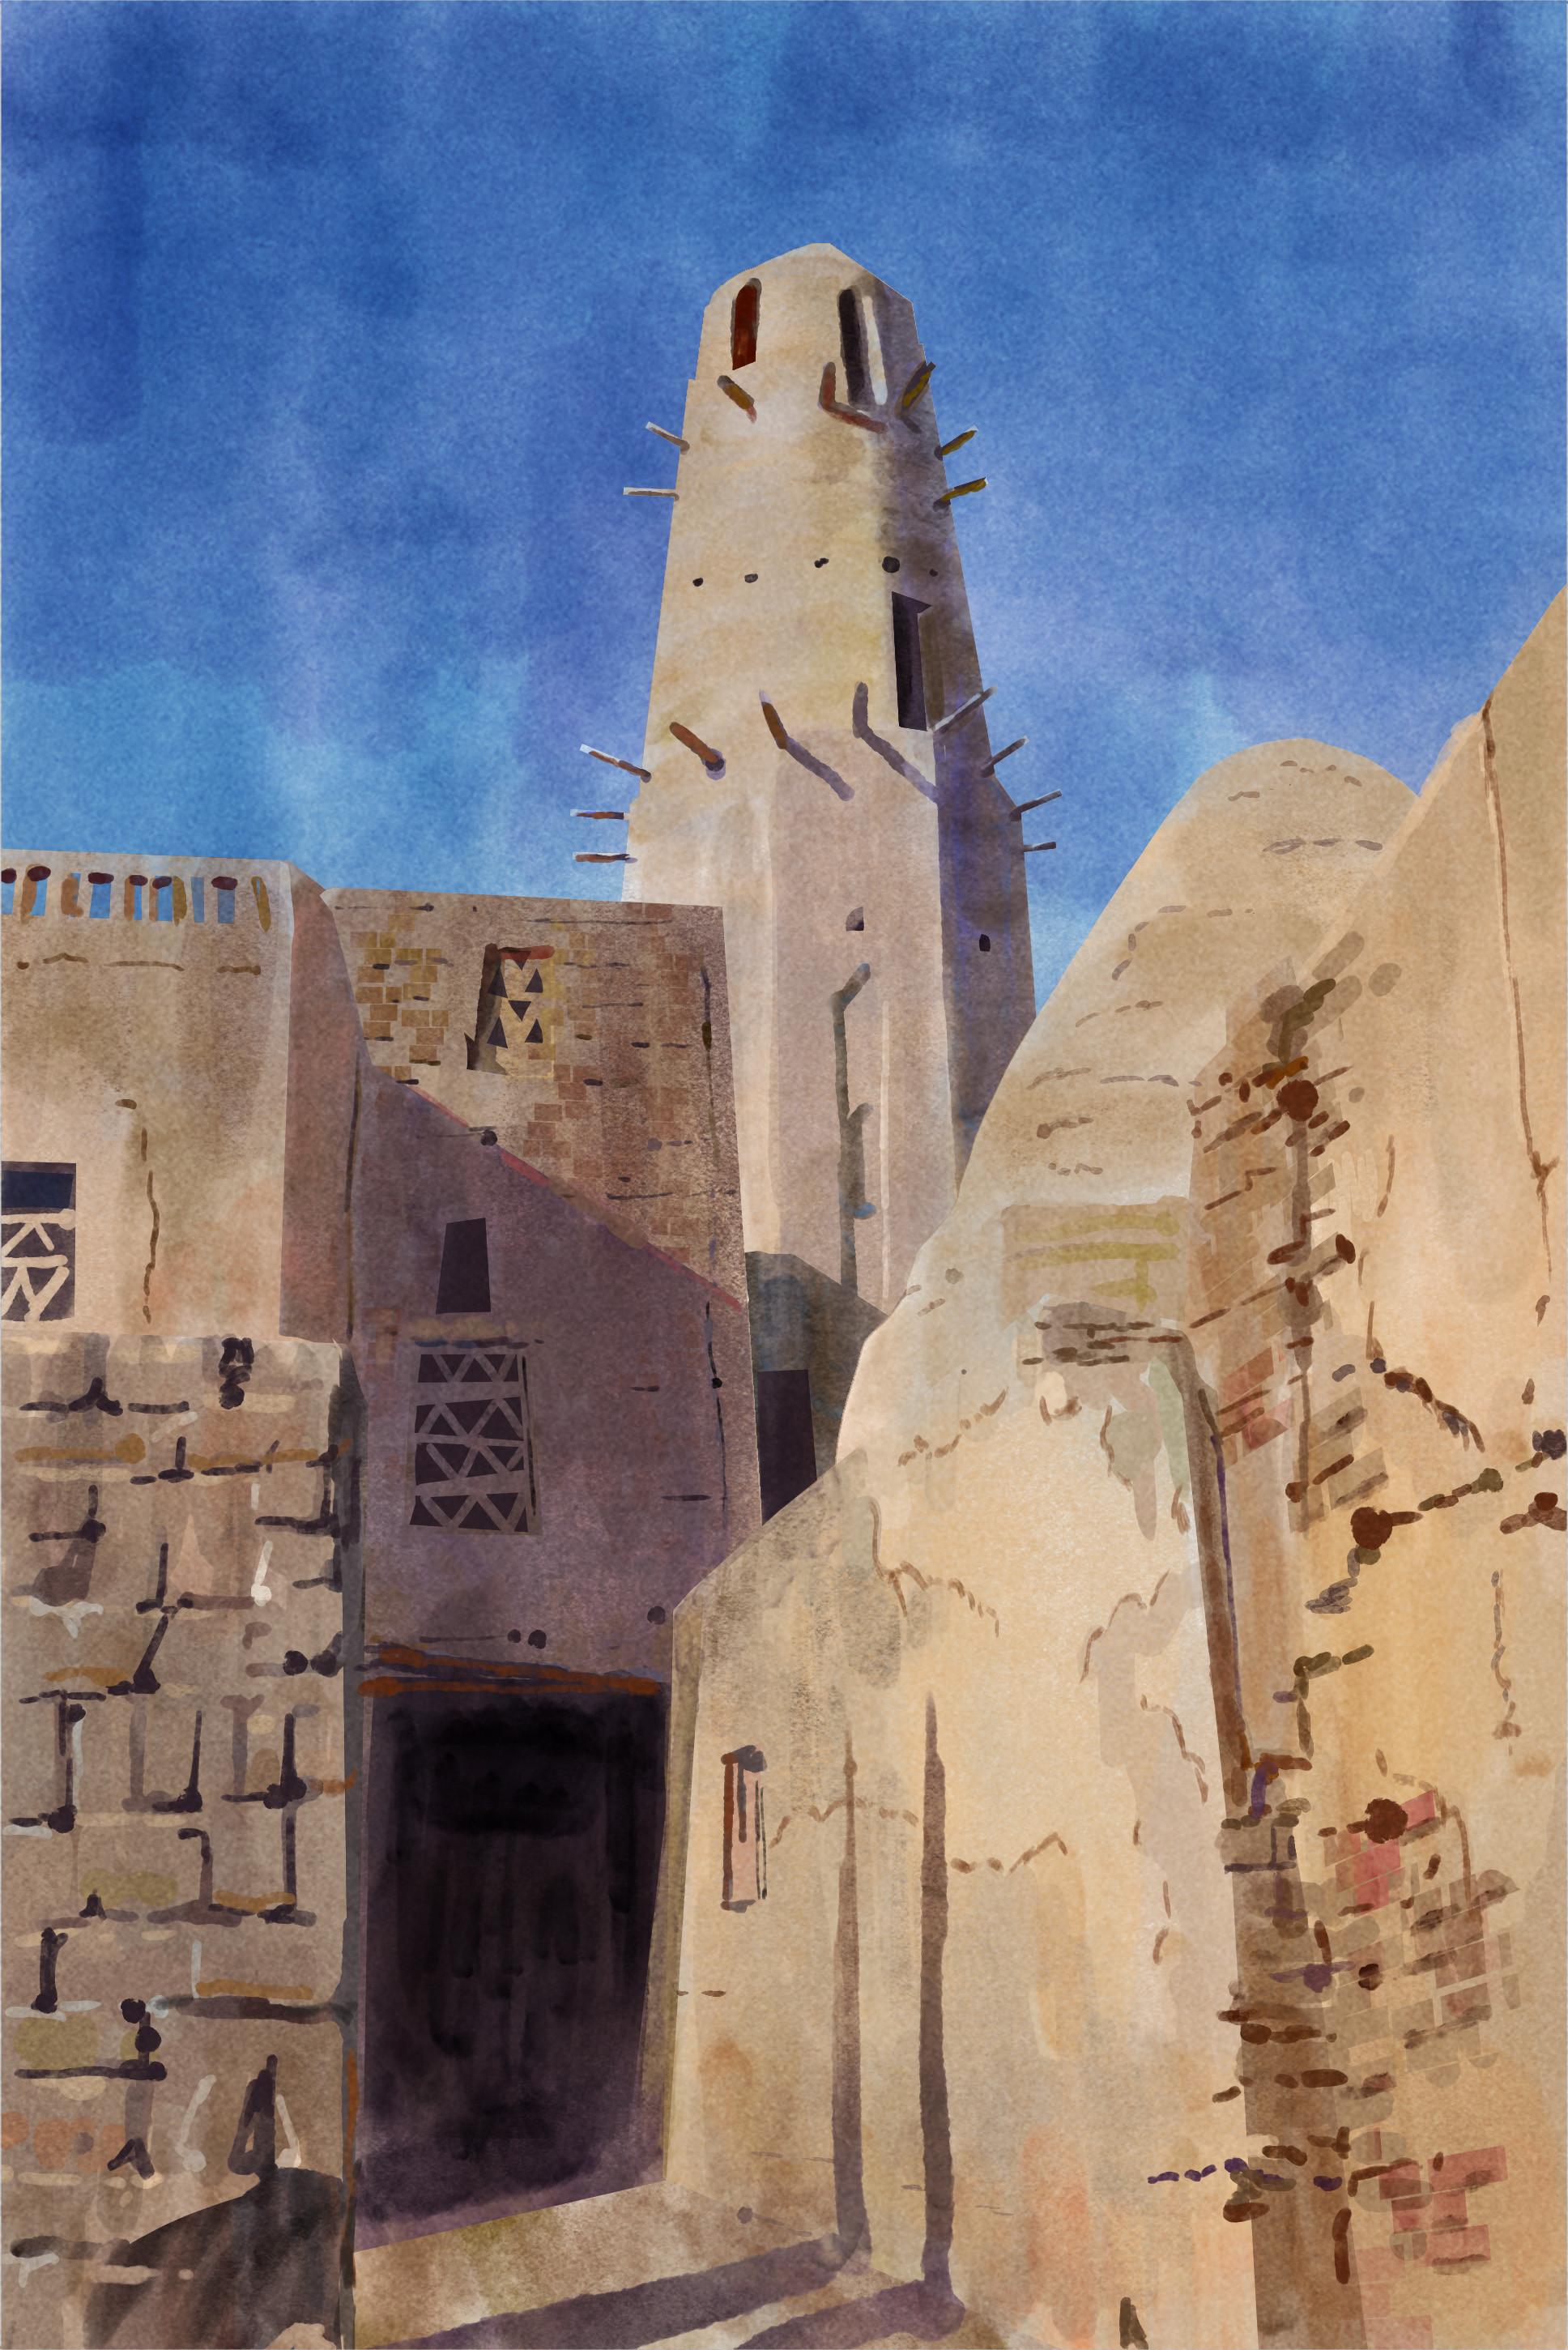 Photo study of Al Qasr, Mosque in Dakhla Oasis